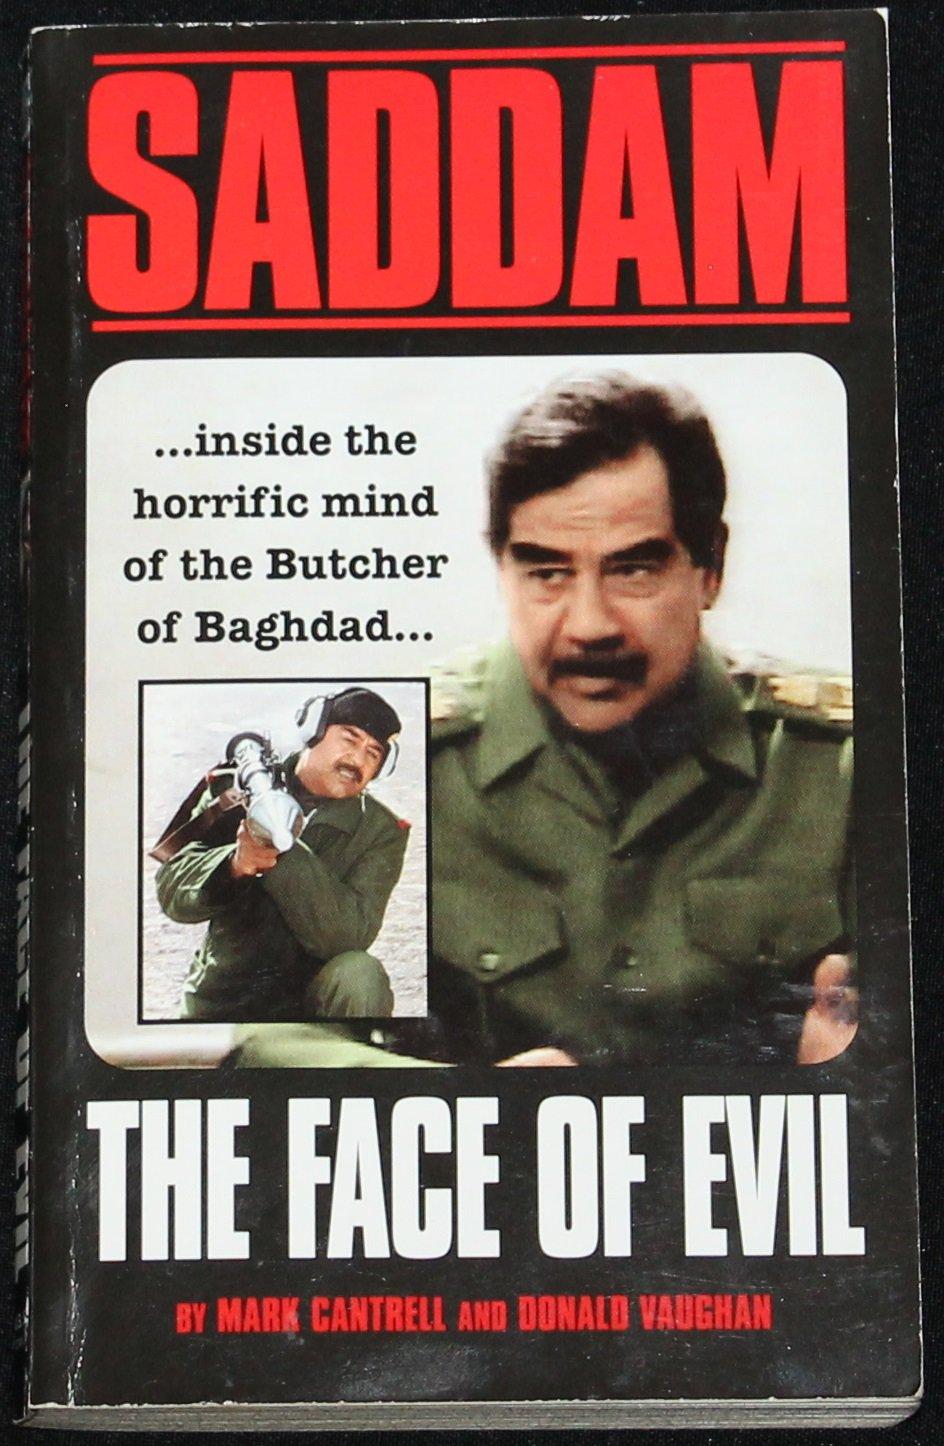 Saddam The Face of Evil - true crime crimes Iraq humanity dictator paperback book